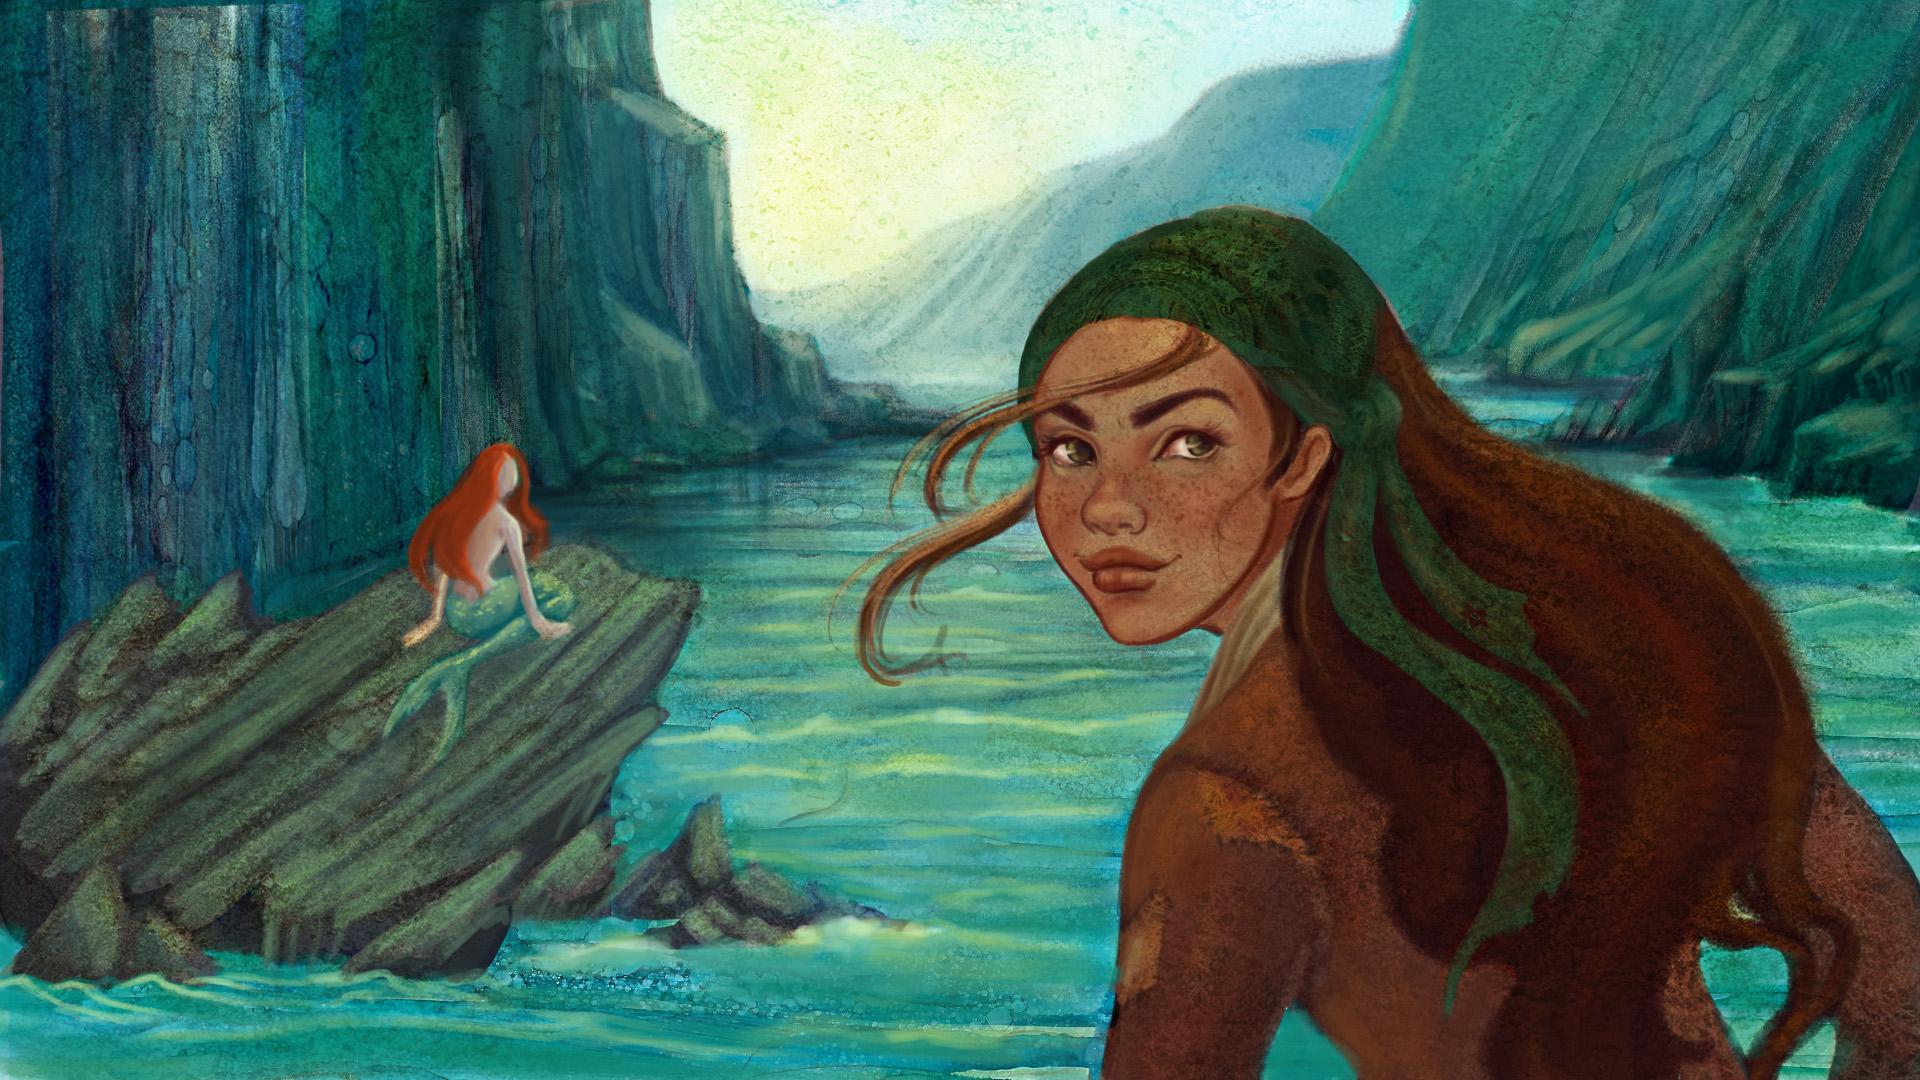 MermaidSighted_FINALVersion.jpg